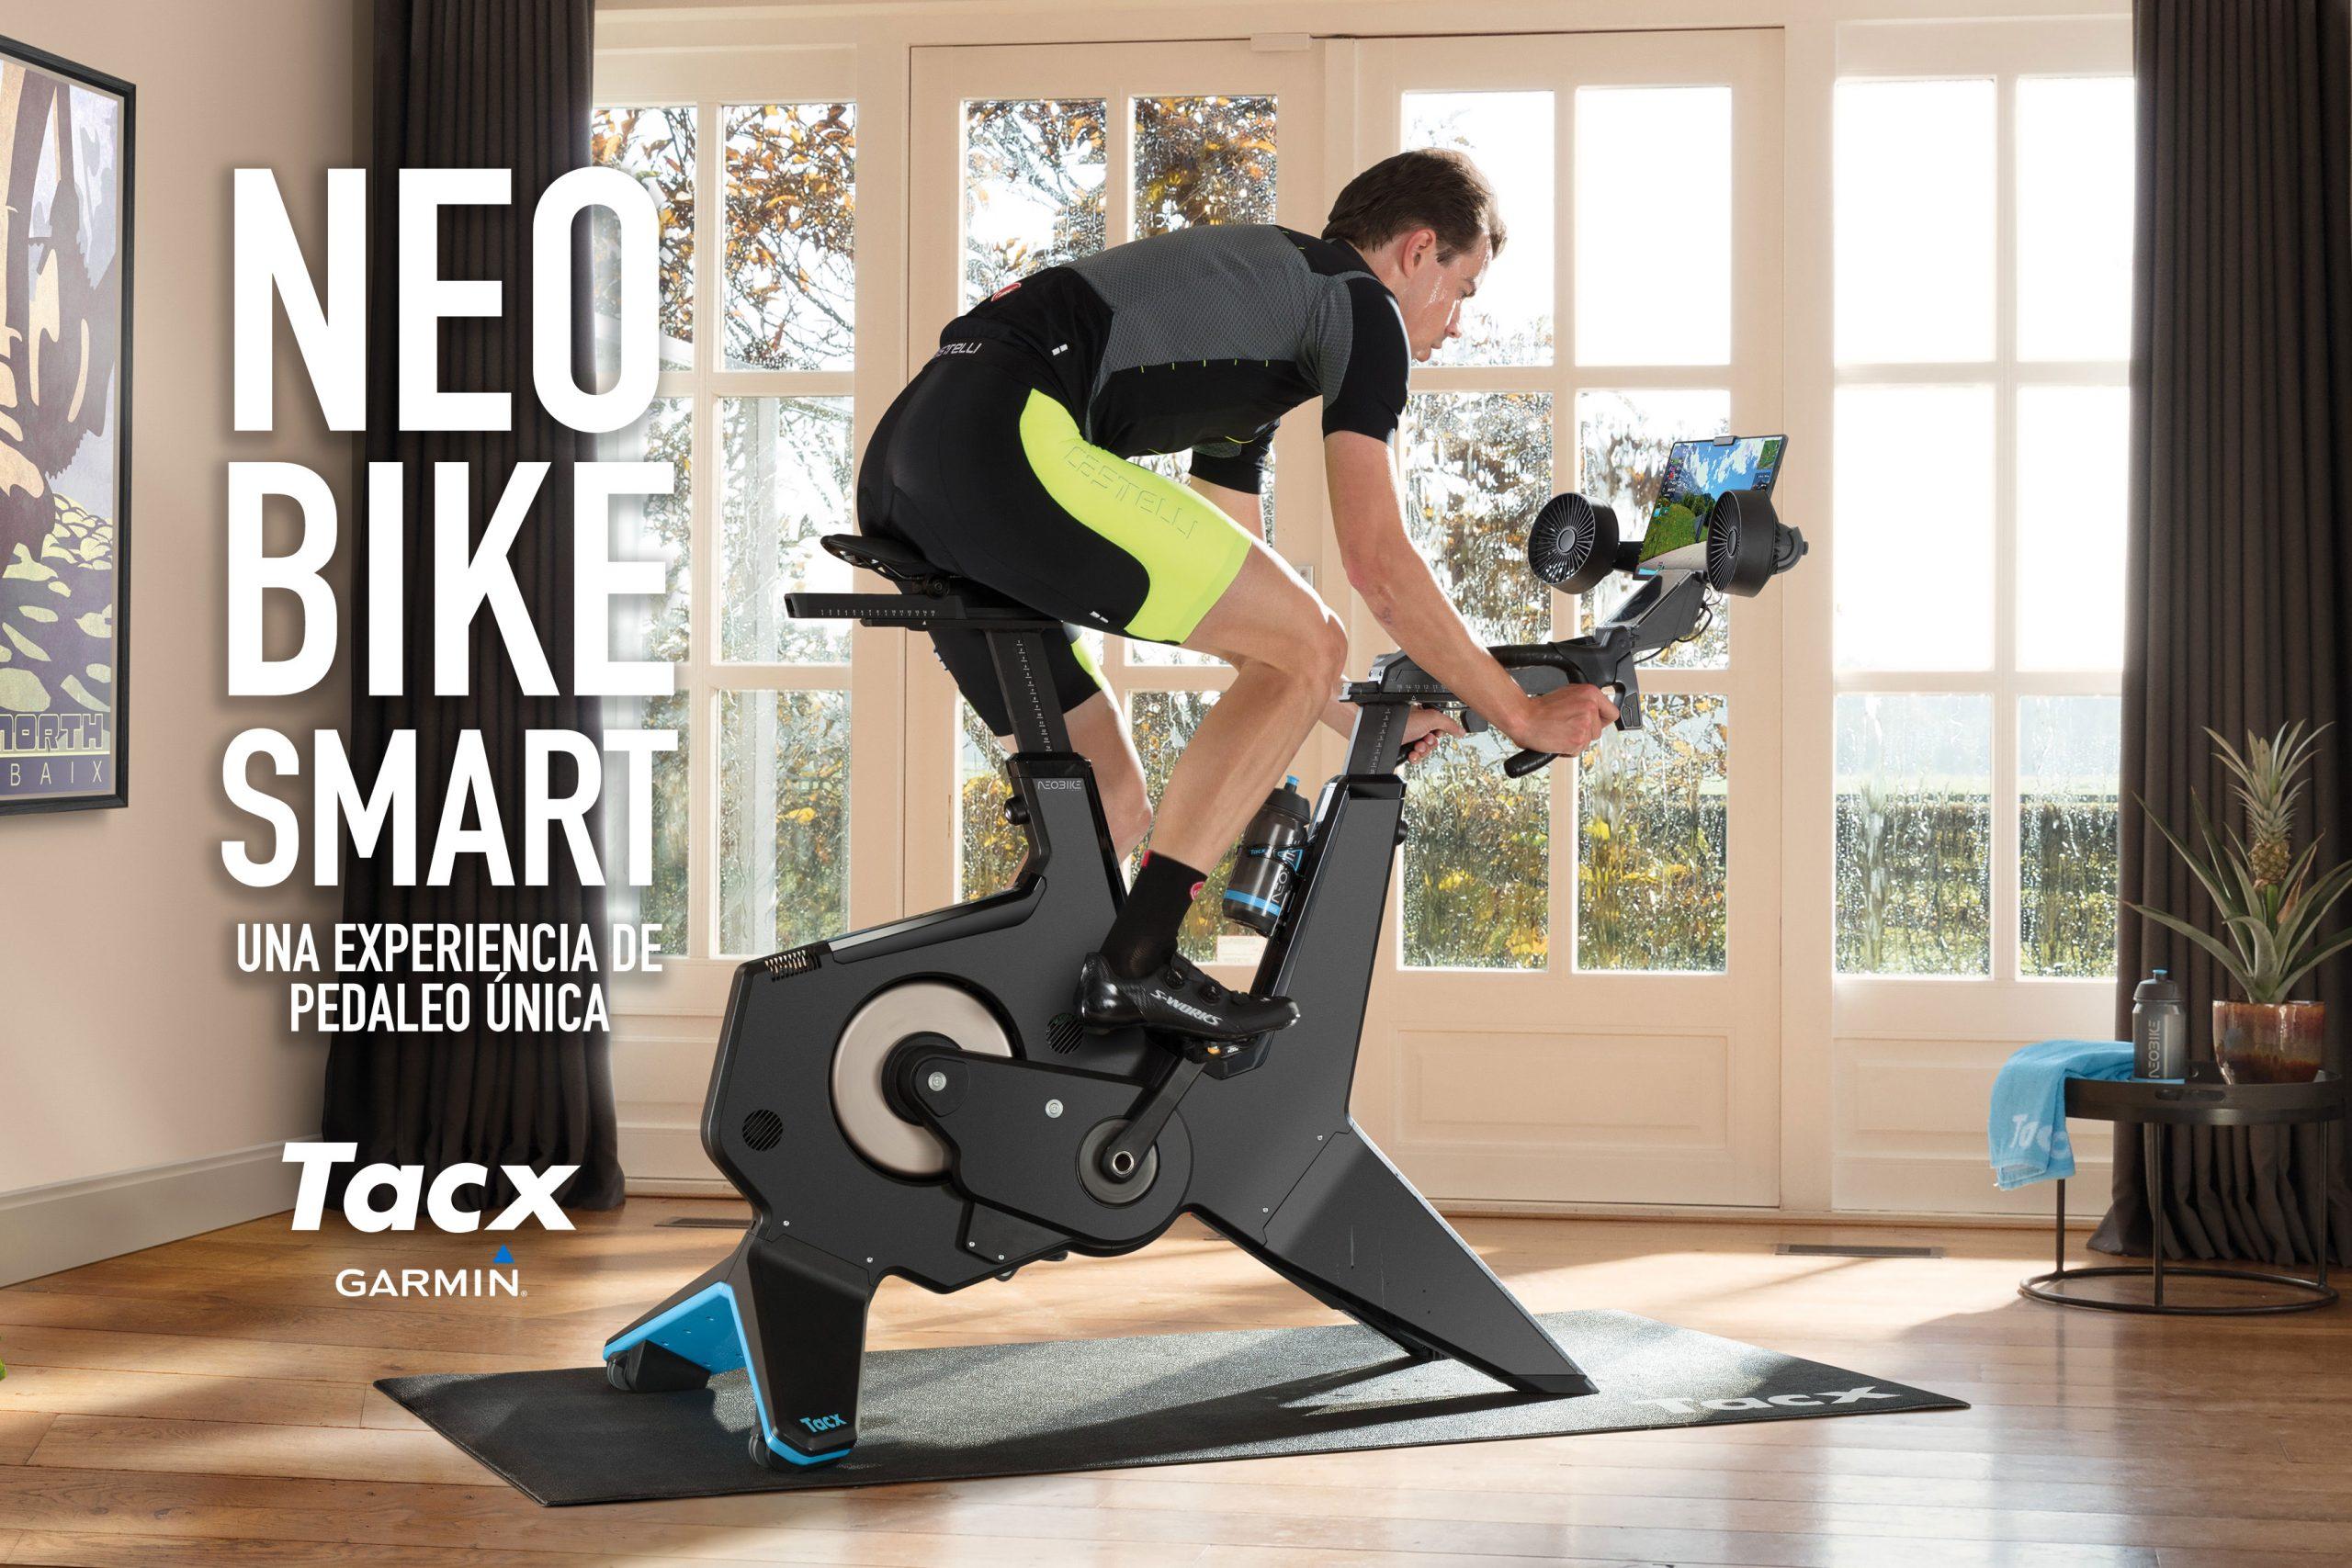 NEO Bike Smart de TACX